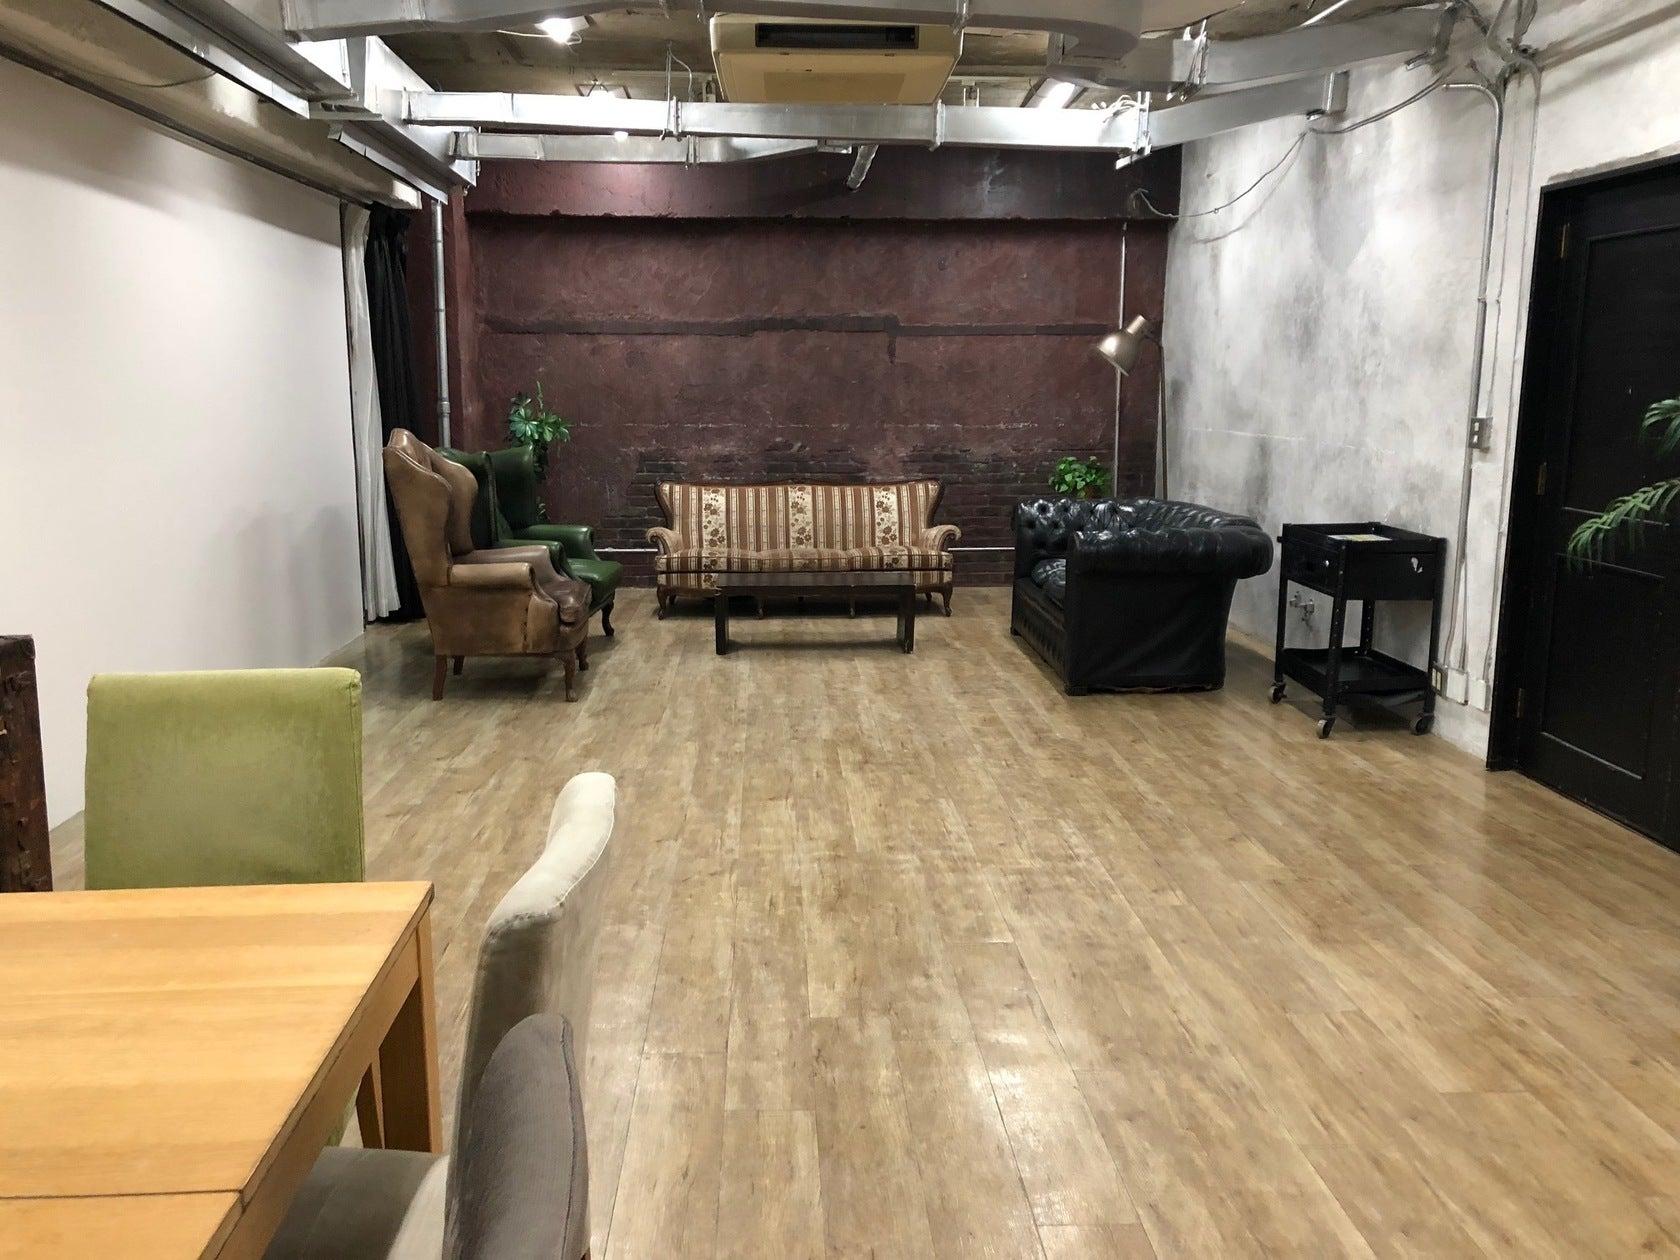 sora3階 RoomK アトリエ風レンタルスペース 【北参道徒歩3分】(sora3階) の写真0